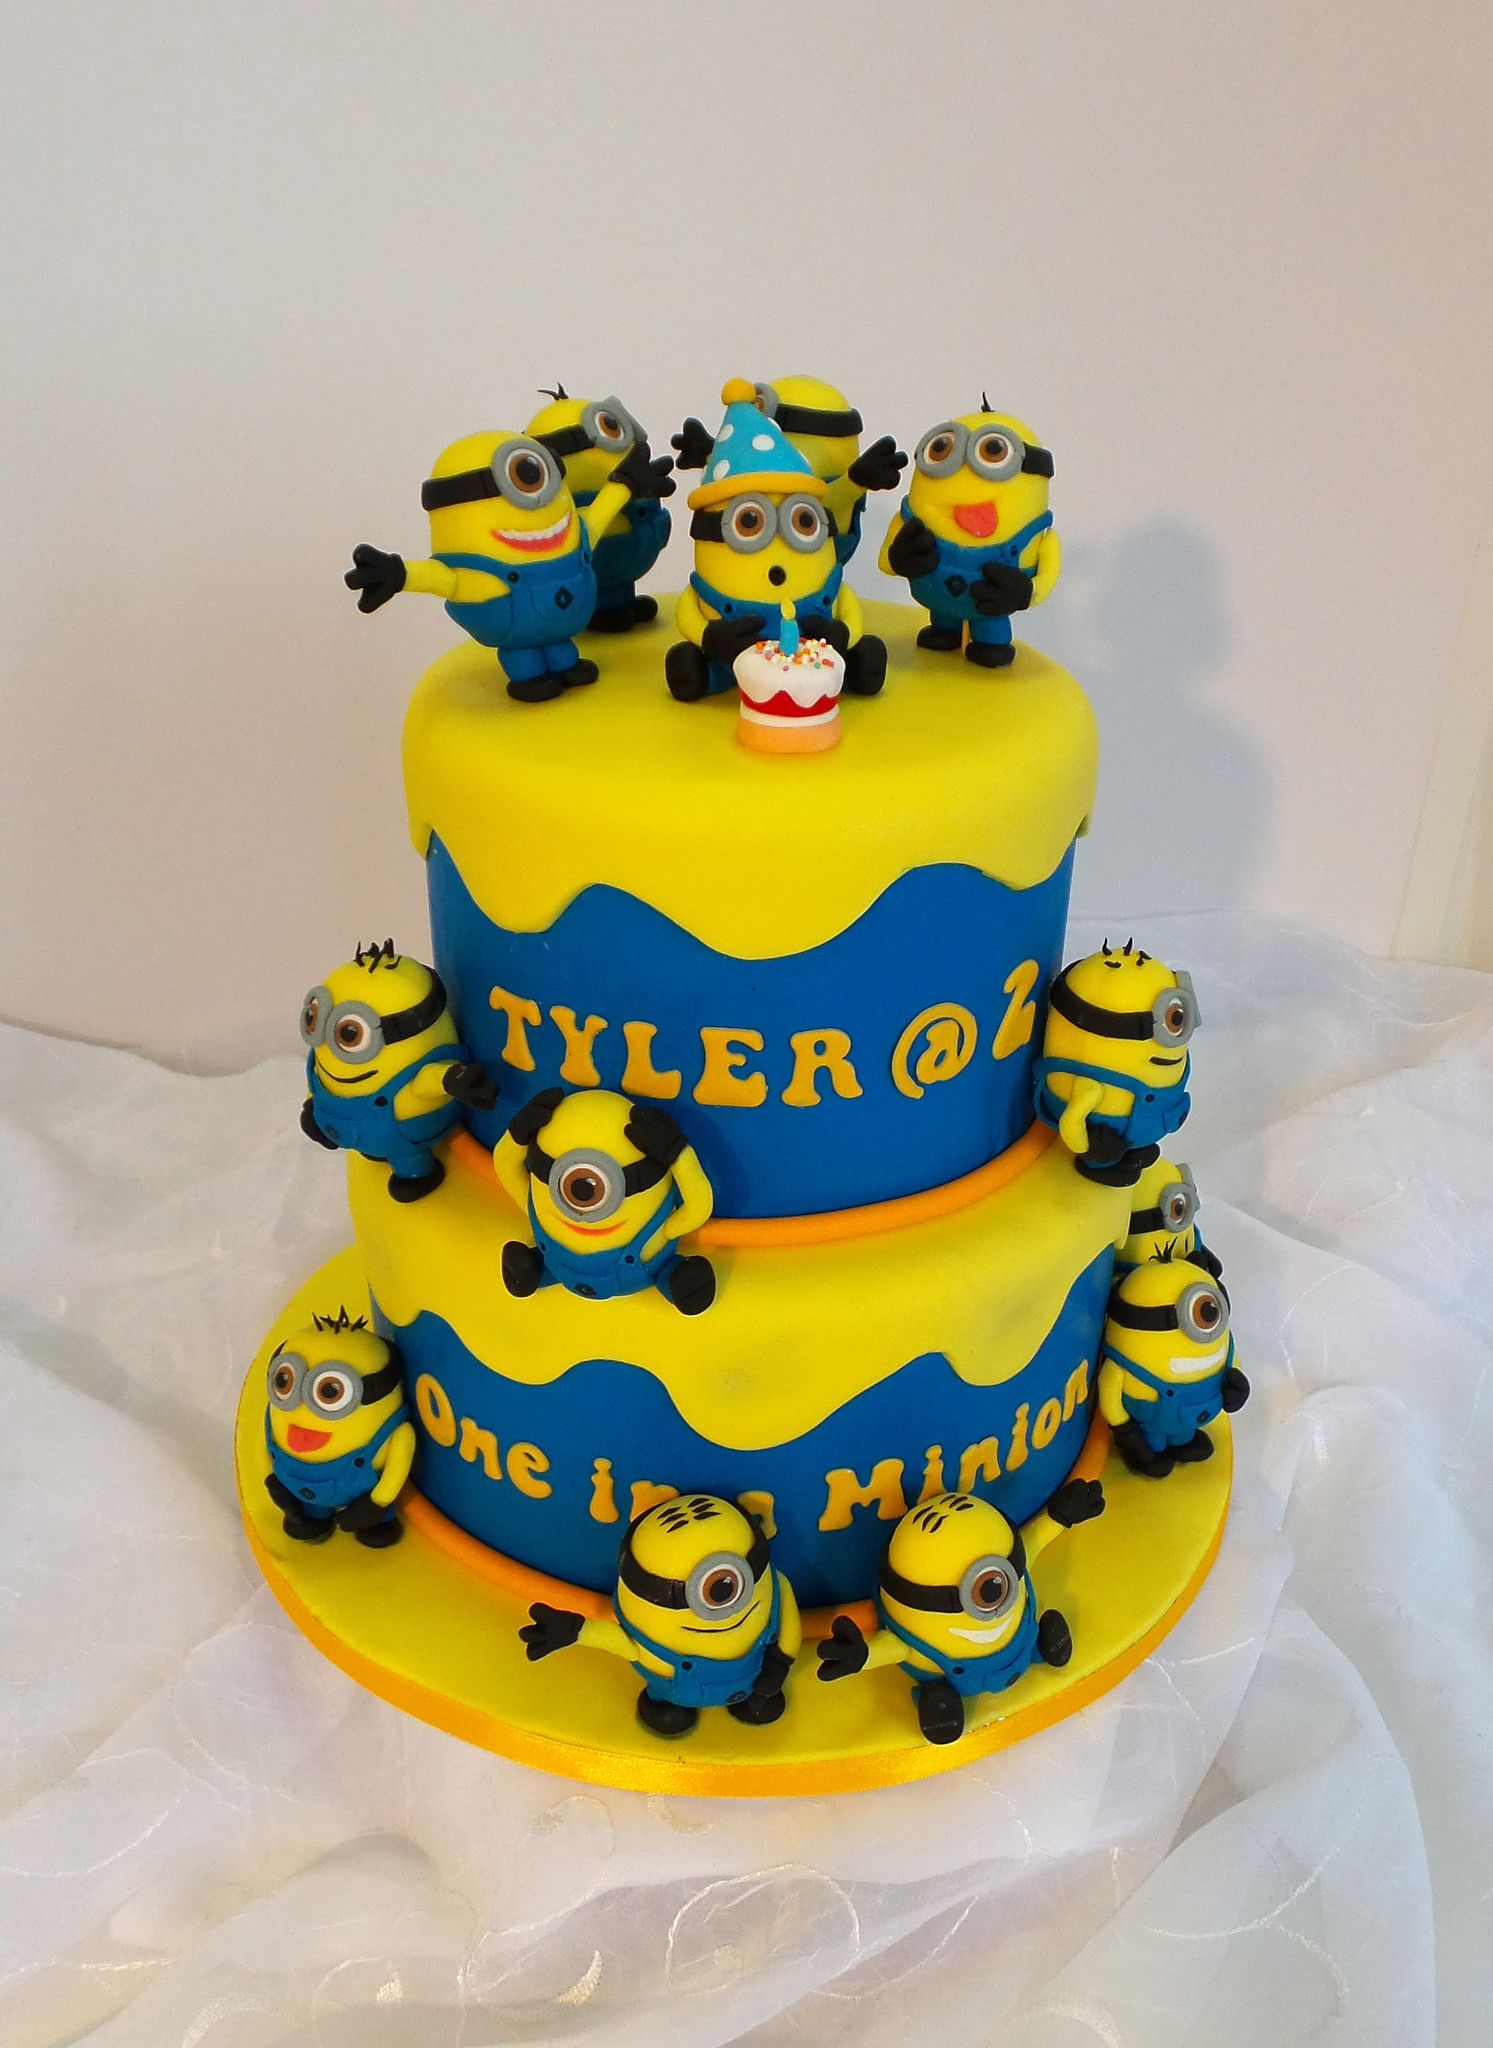 Two Tier Minion Themed Birthday Cake